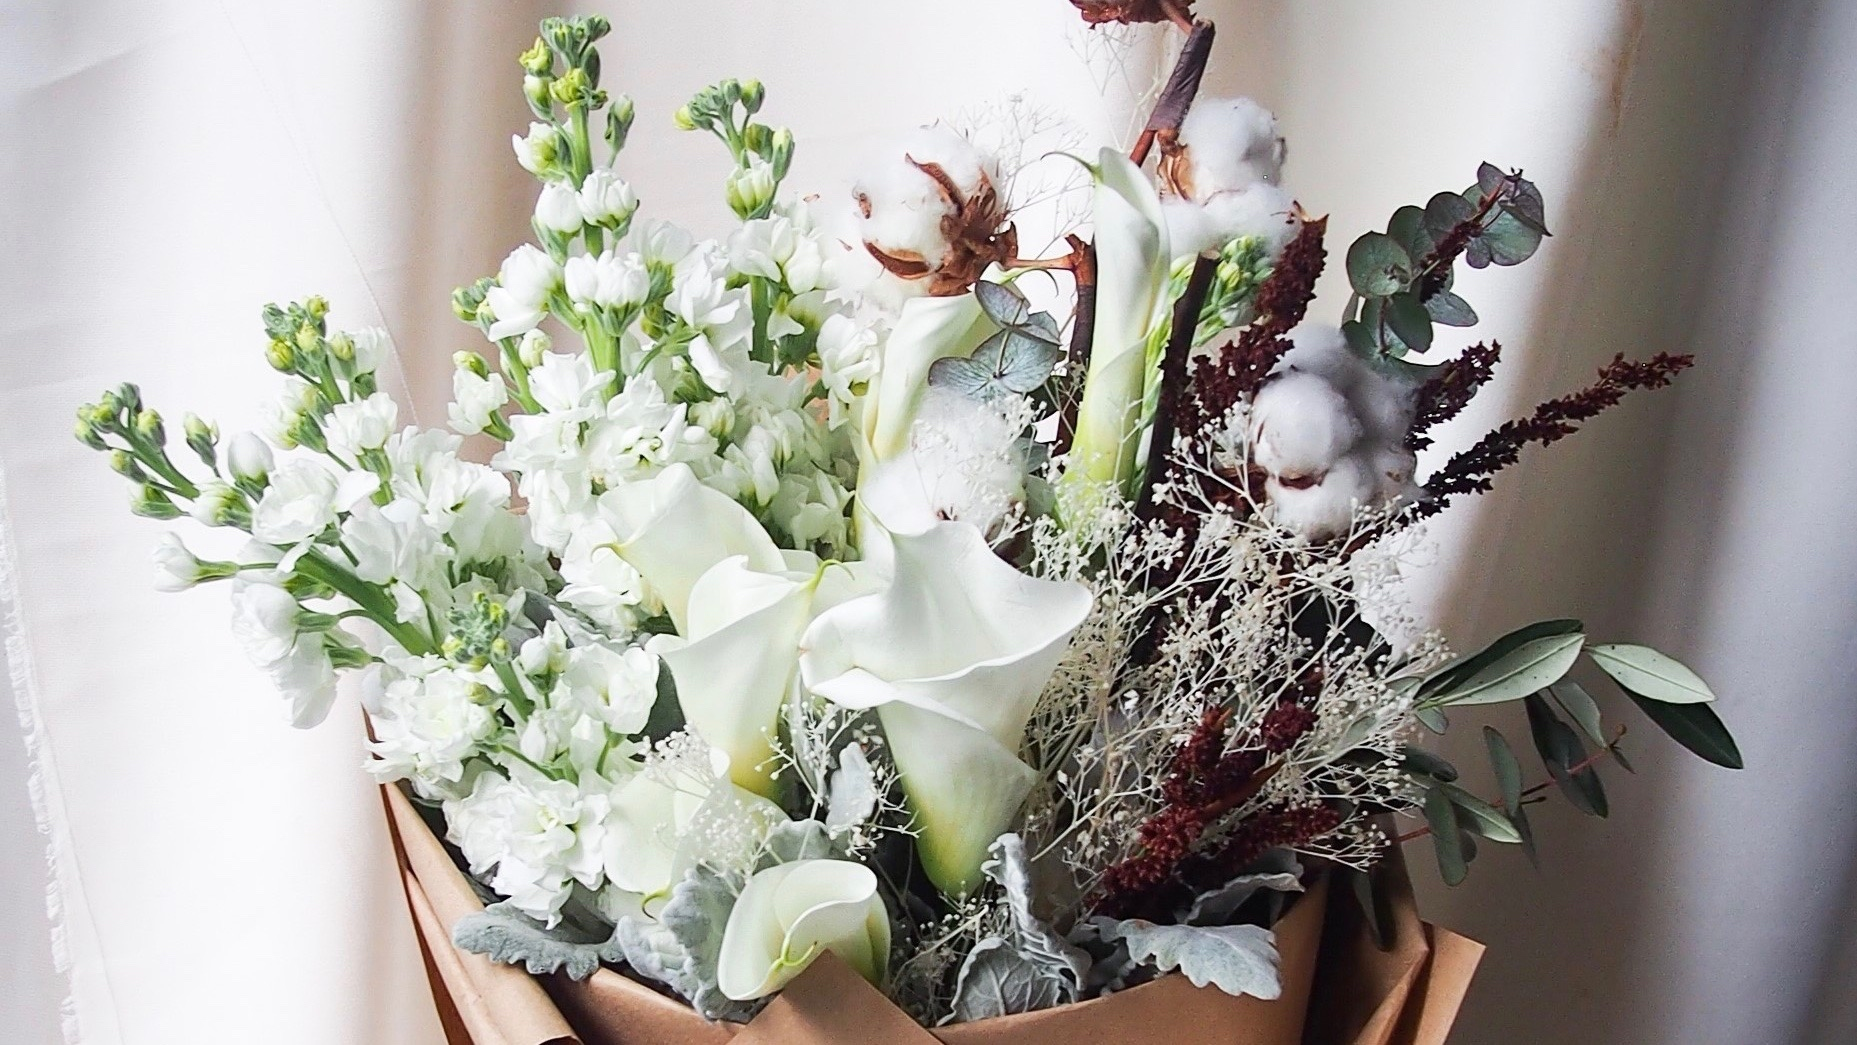 Floral Magic | Shopping in Kallang, Singapore